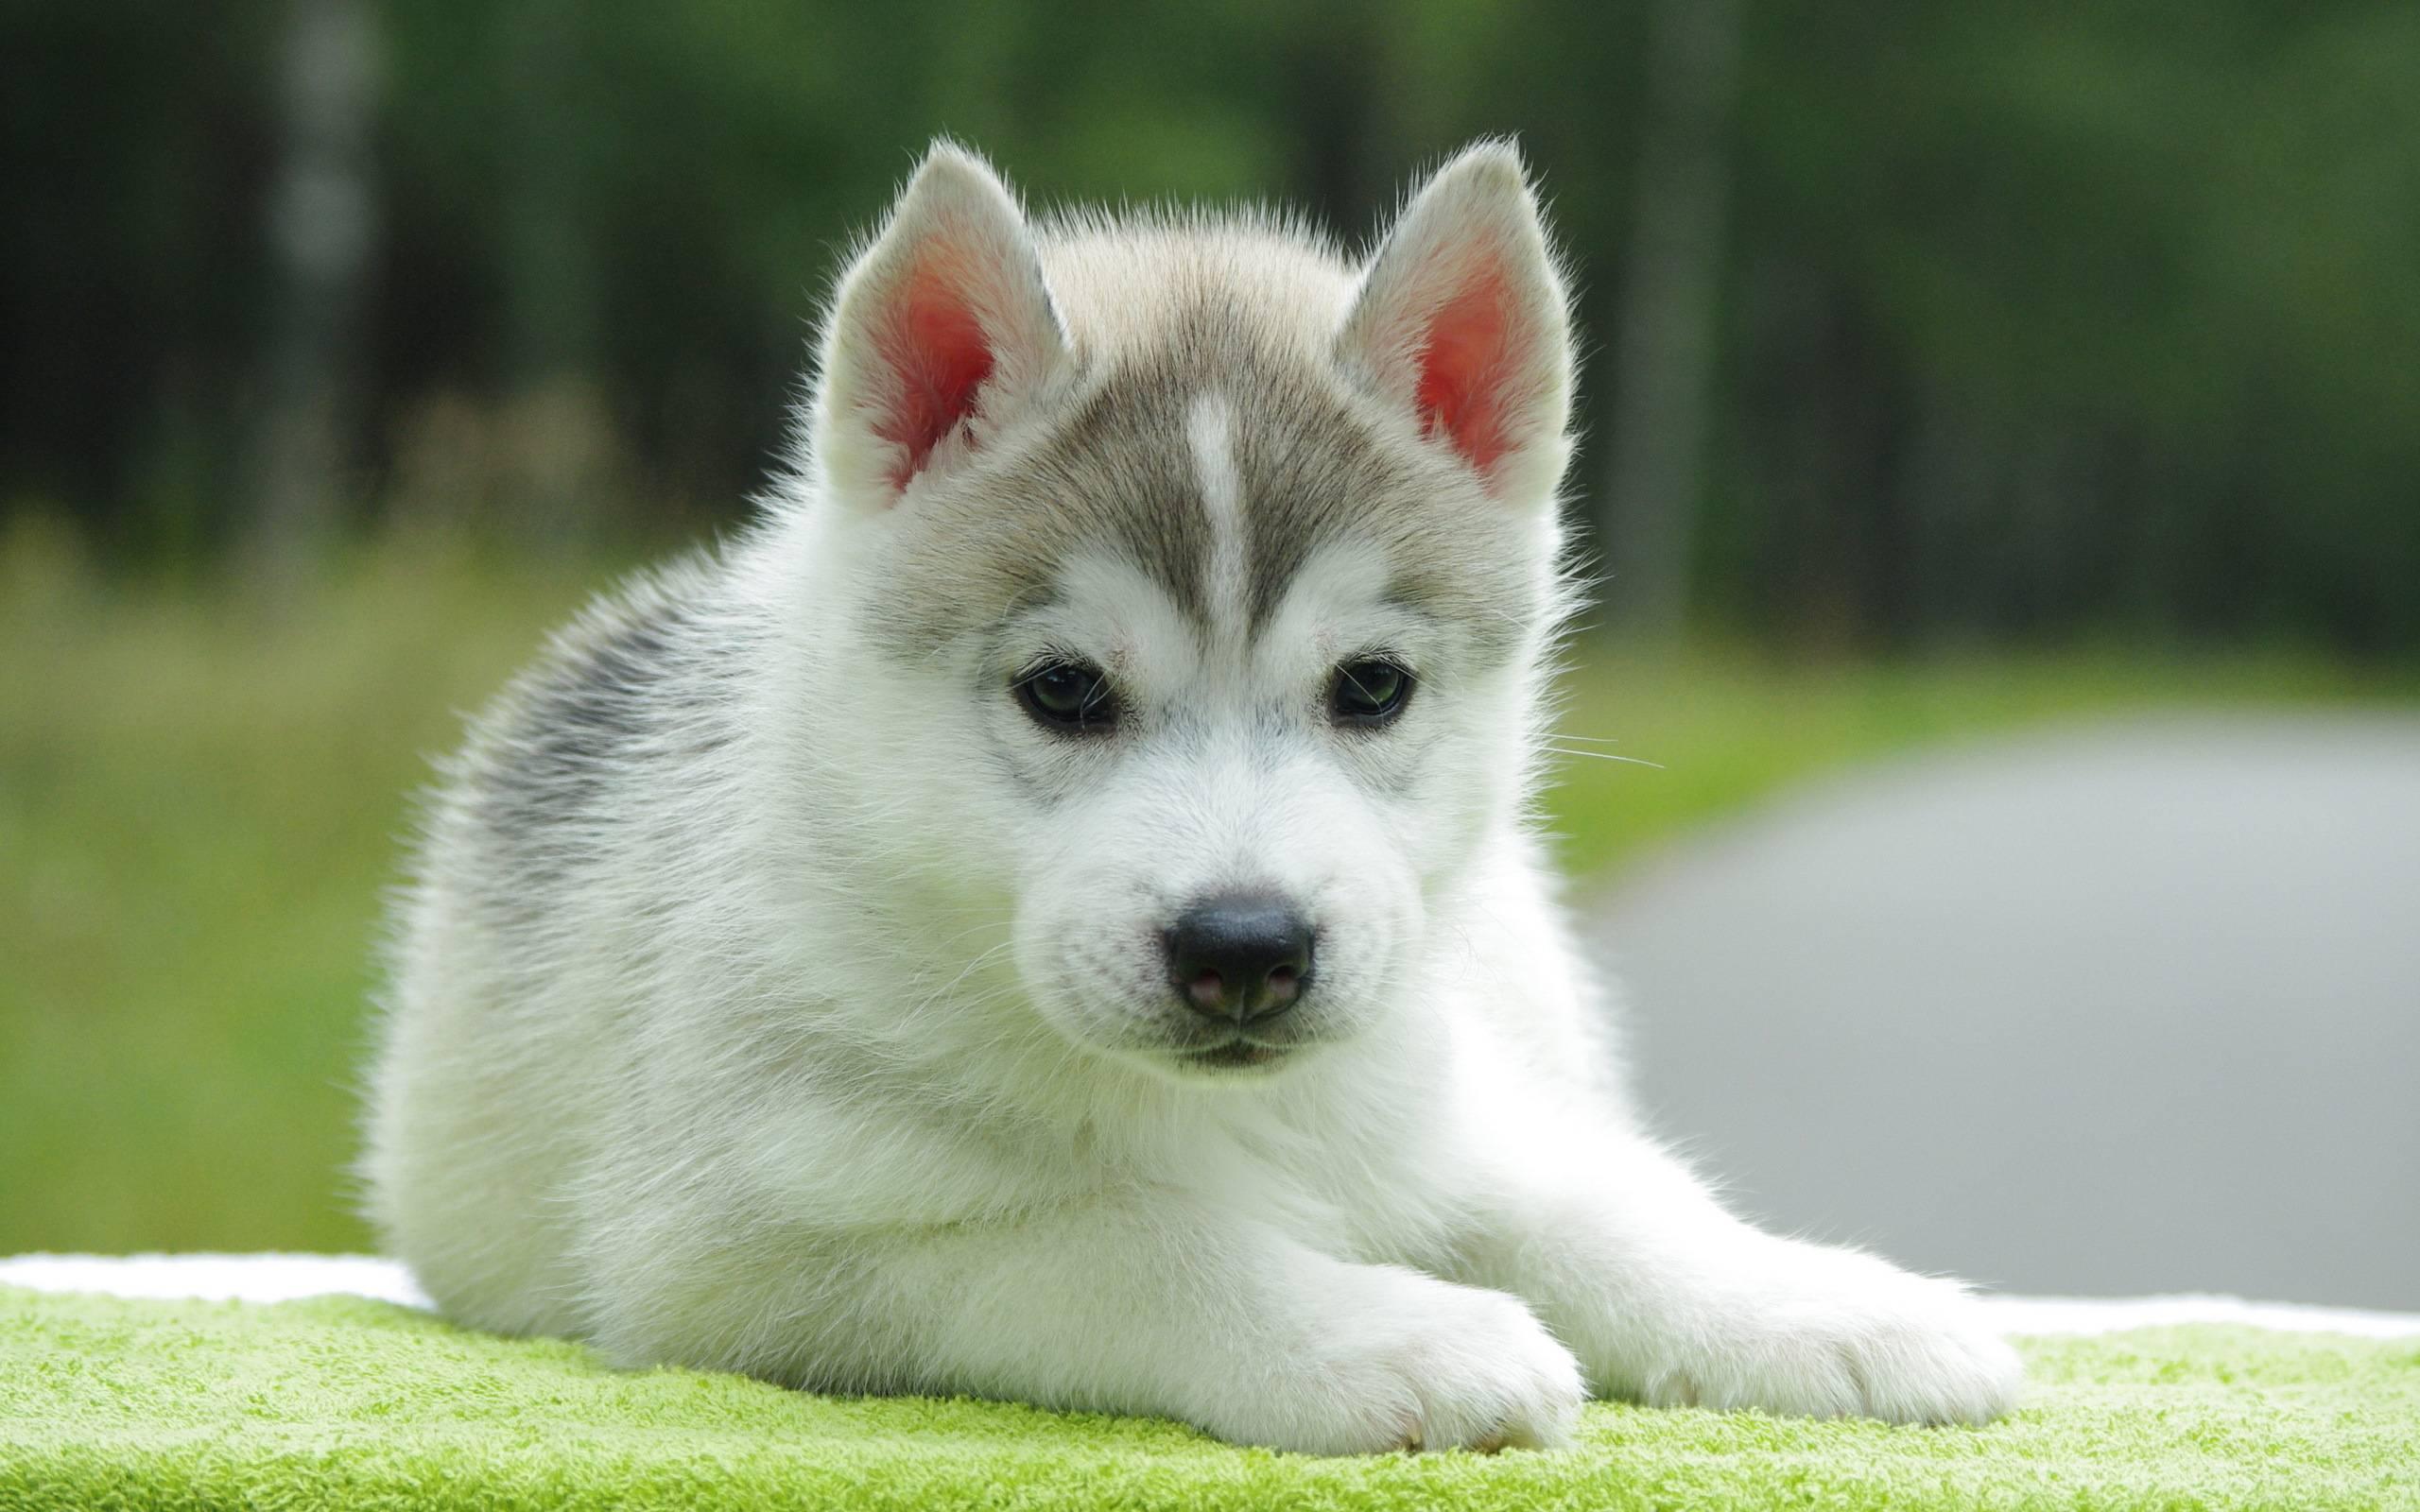 Husky Cute Puppy   Dogs Wallpaper 2560x1600